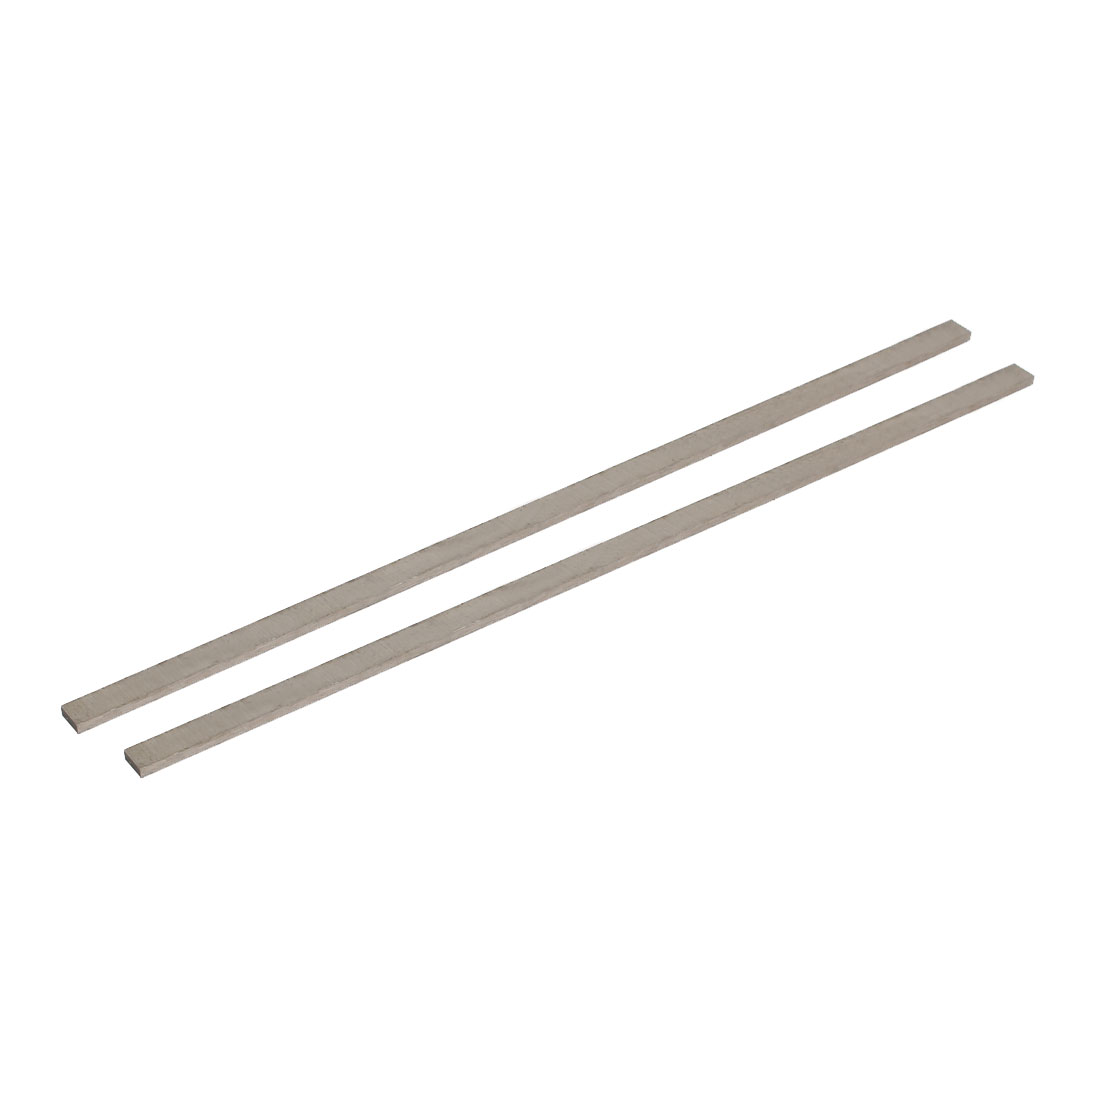 2mmx6mmx200mm Metal Rectangle Lathe Tool Boring Bar Fly Cutter Silver Tone 2pcs